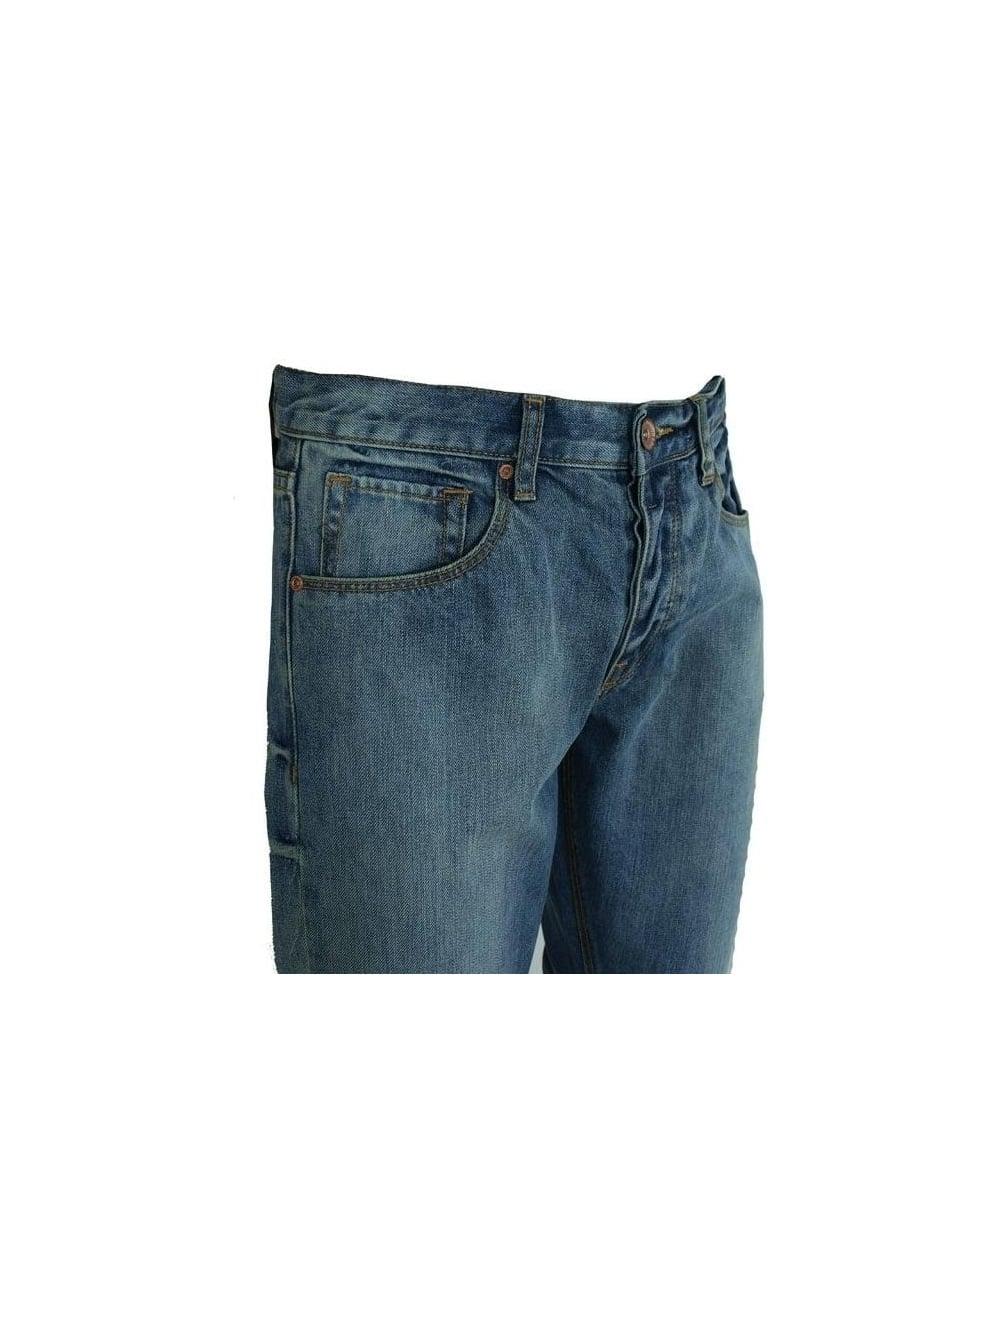 92550fea Mens Dr Denim Raymond Regular Straight Jeans - Blue Vintage | SALE ...